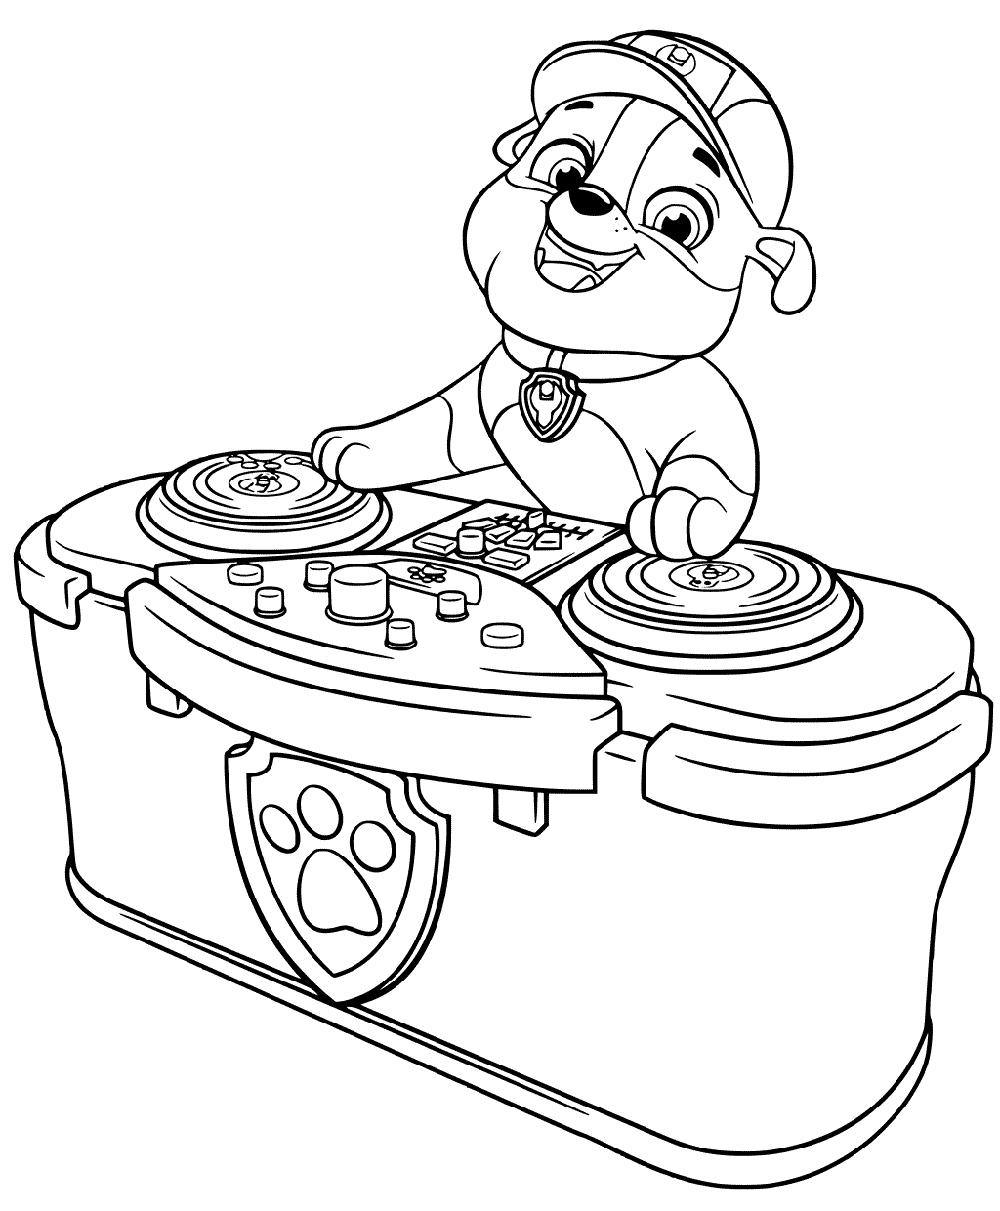 DJ Rubble